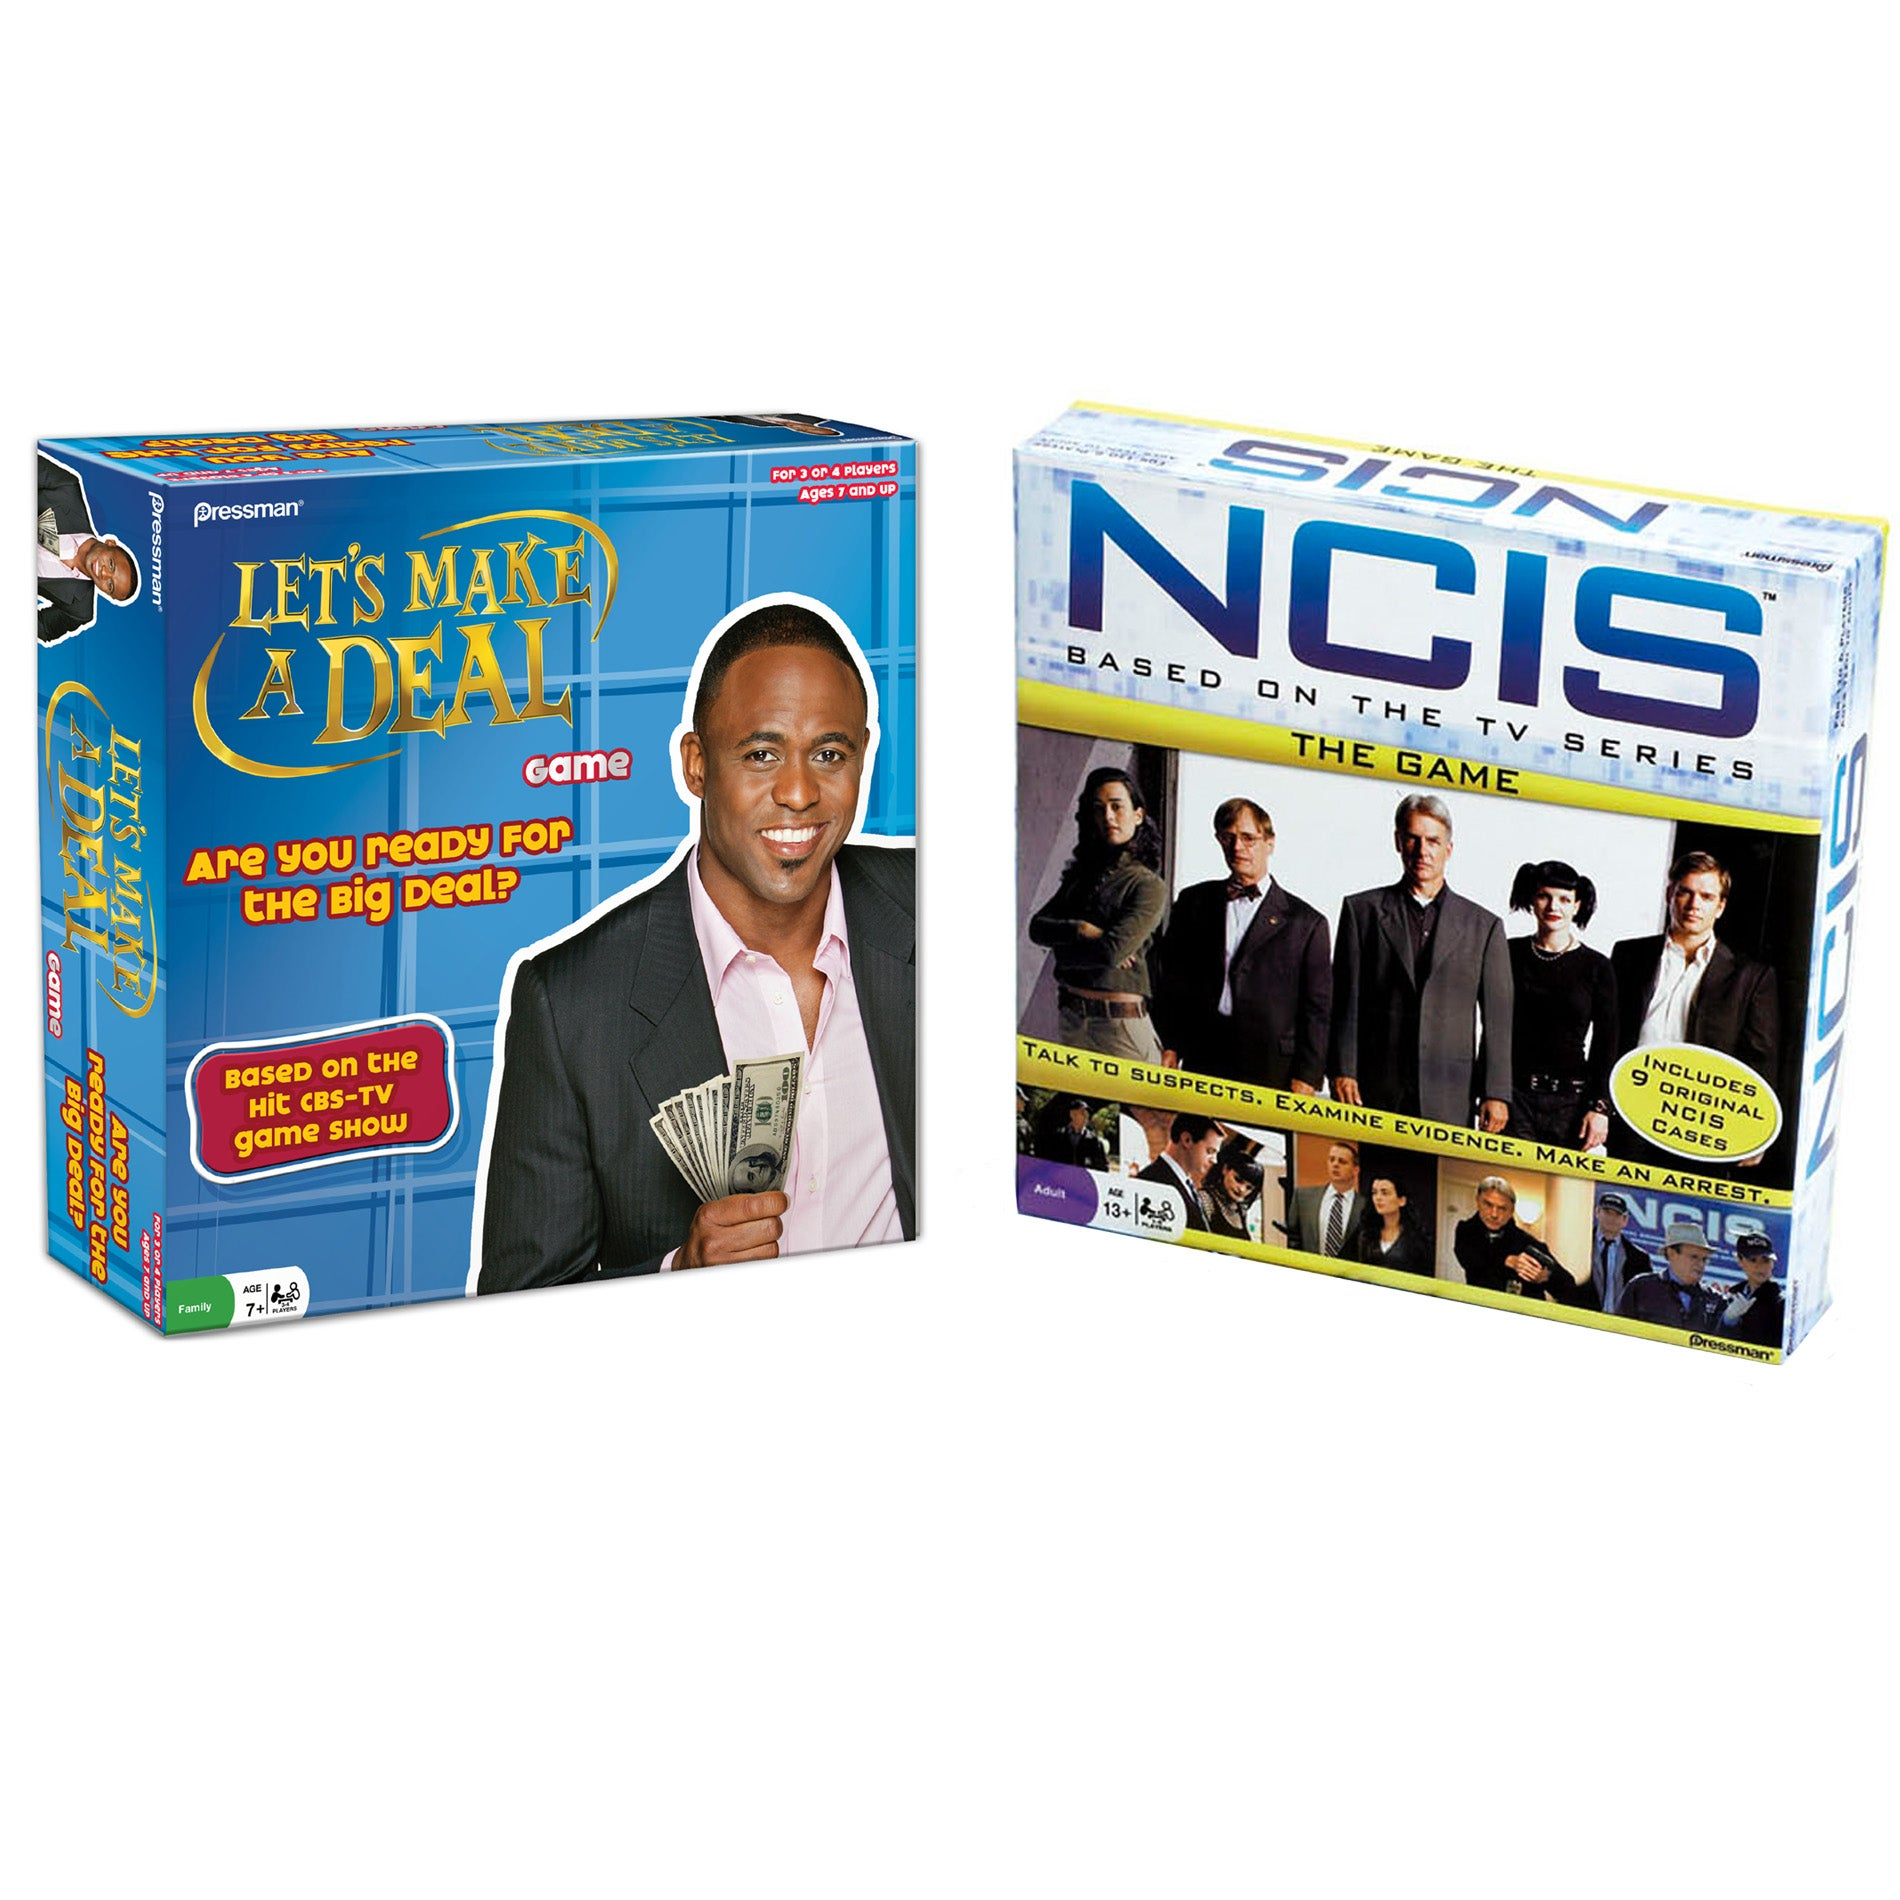 Pressman Games Make a Deal and NCIS Game Set